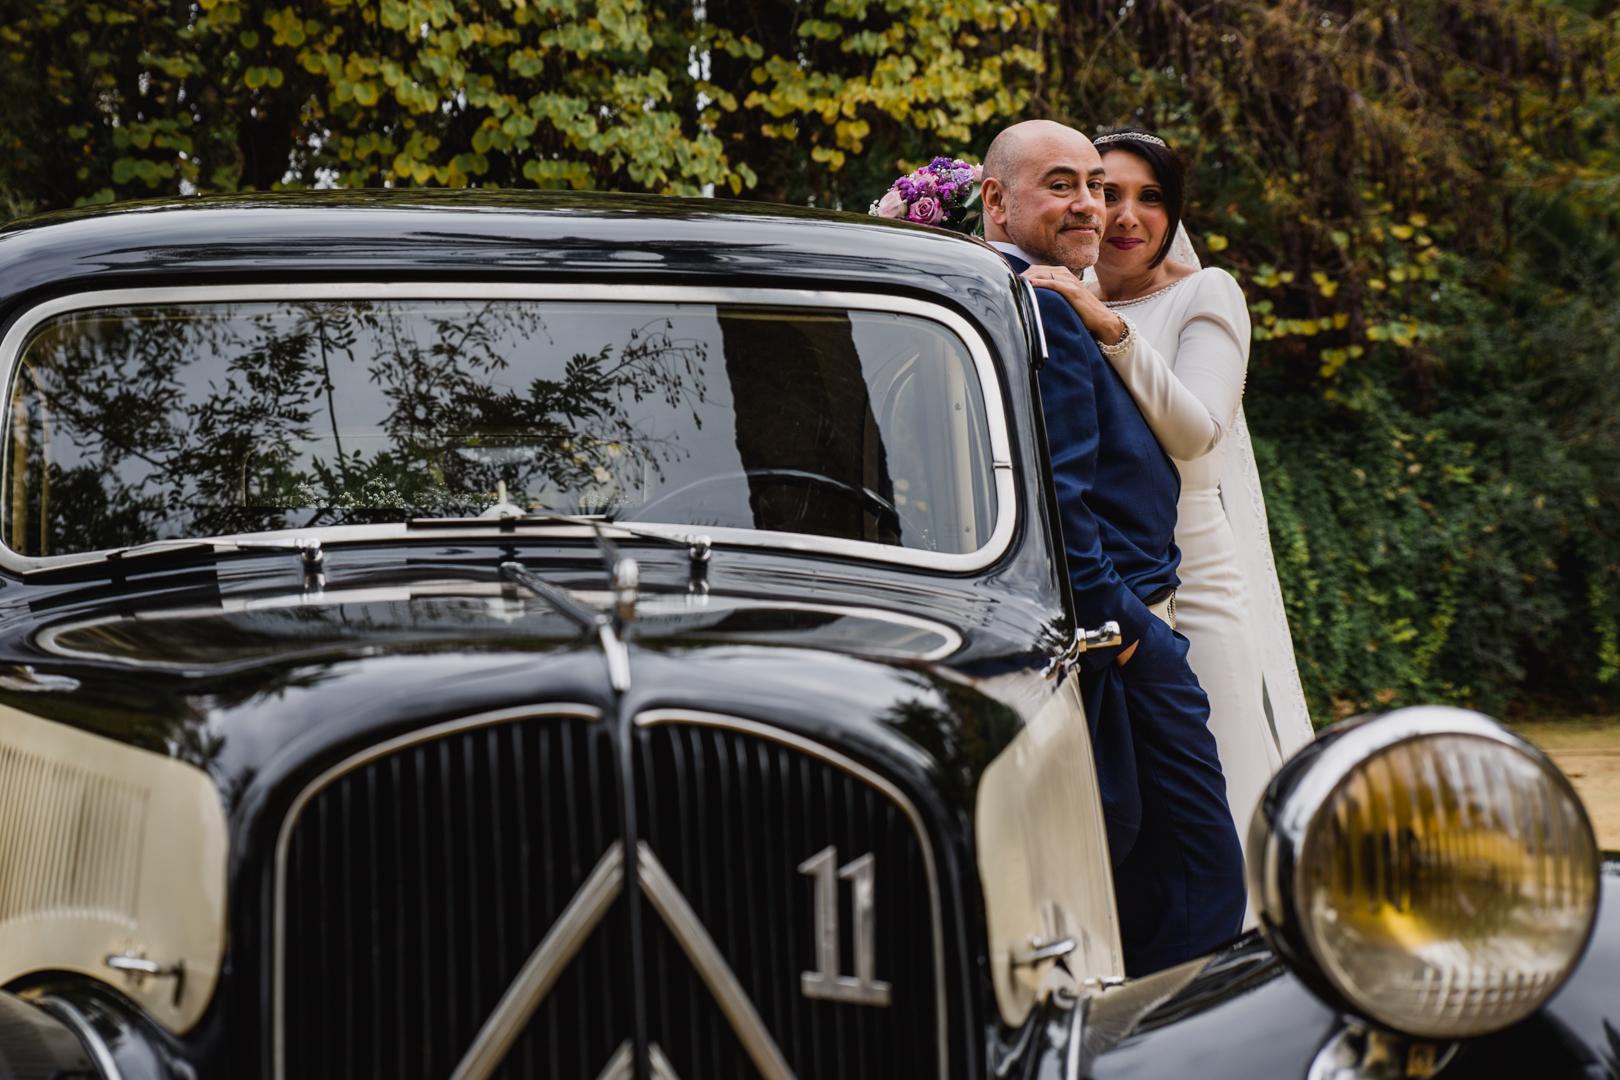 2-boda hacienda torre doña maria. carlos pavon fotografia. 600257783-7.jpg